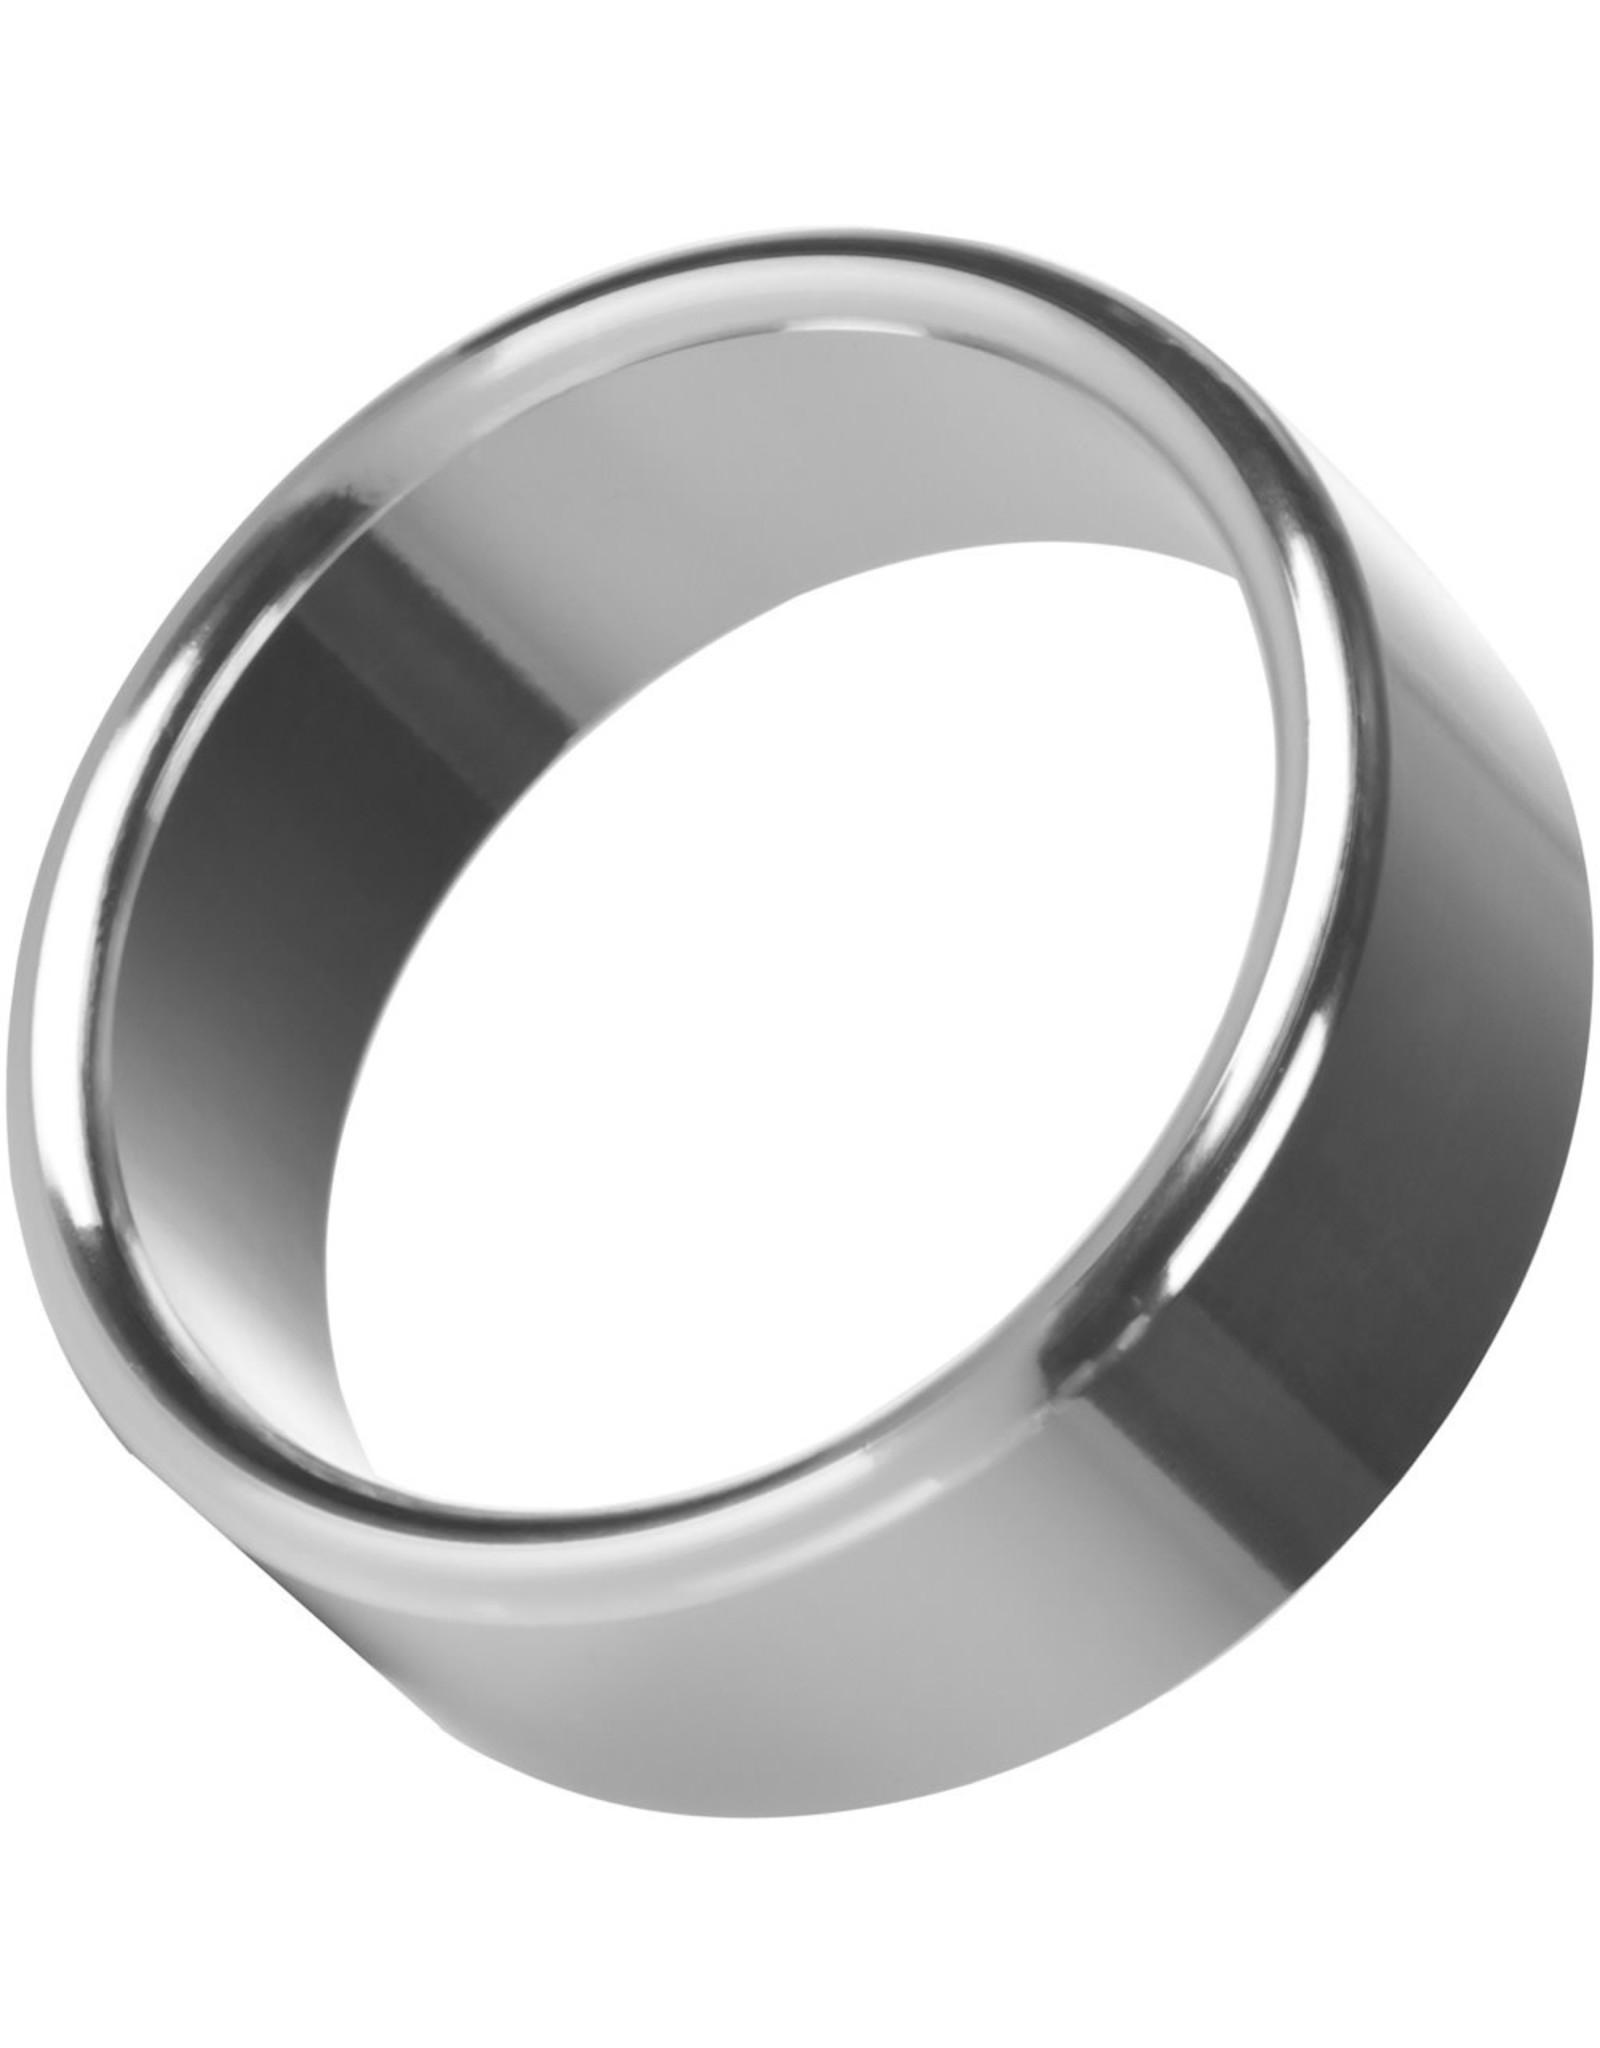 "CALEXOTICS - ALLOY METALLIC RING - LARGE 1.75""X.75"""